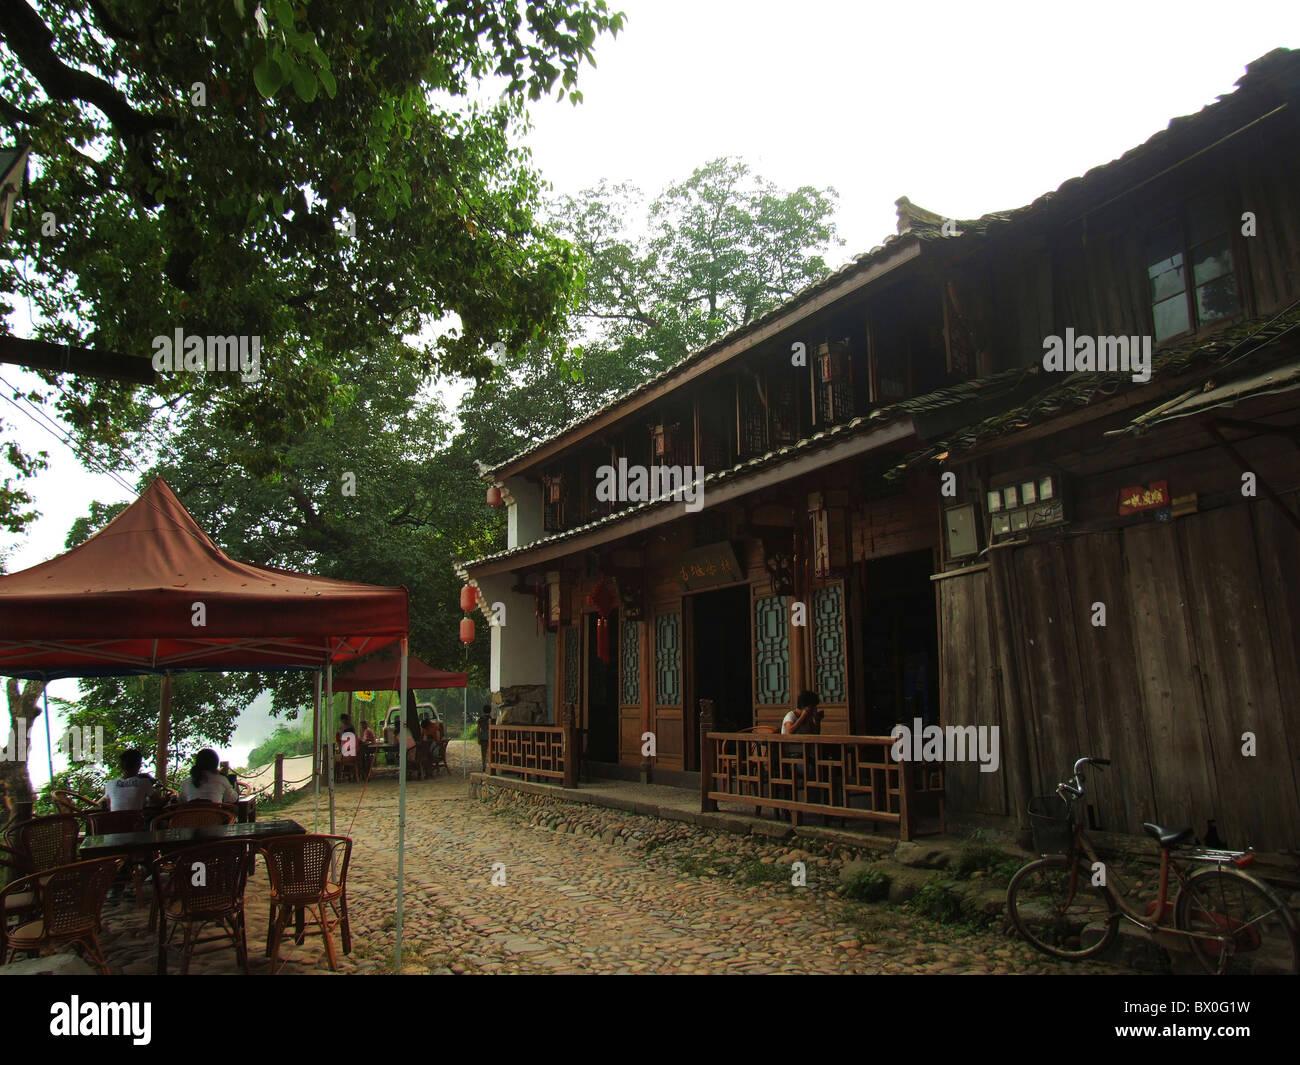 Case Tradizionali Cinesi : Case tradizionali in città dagangtou lishui nella provincia di